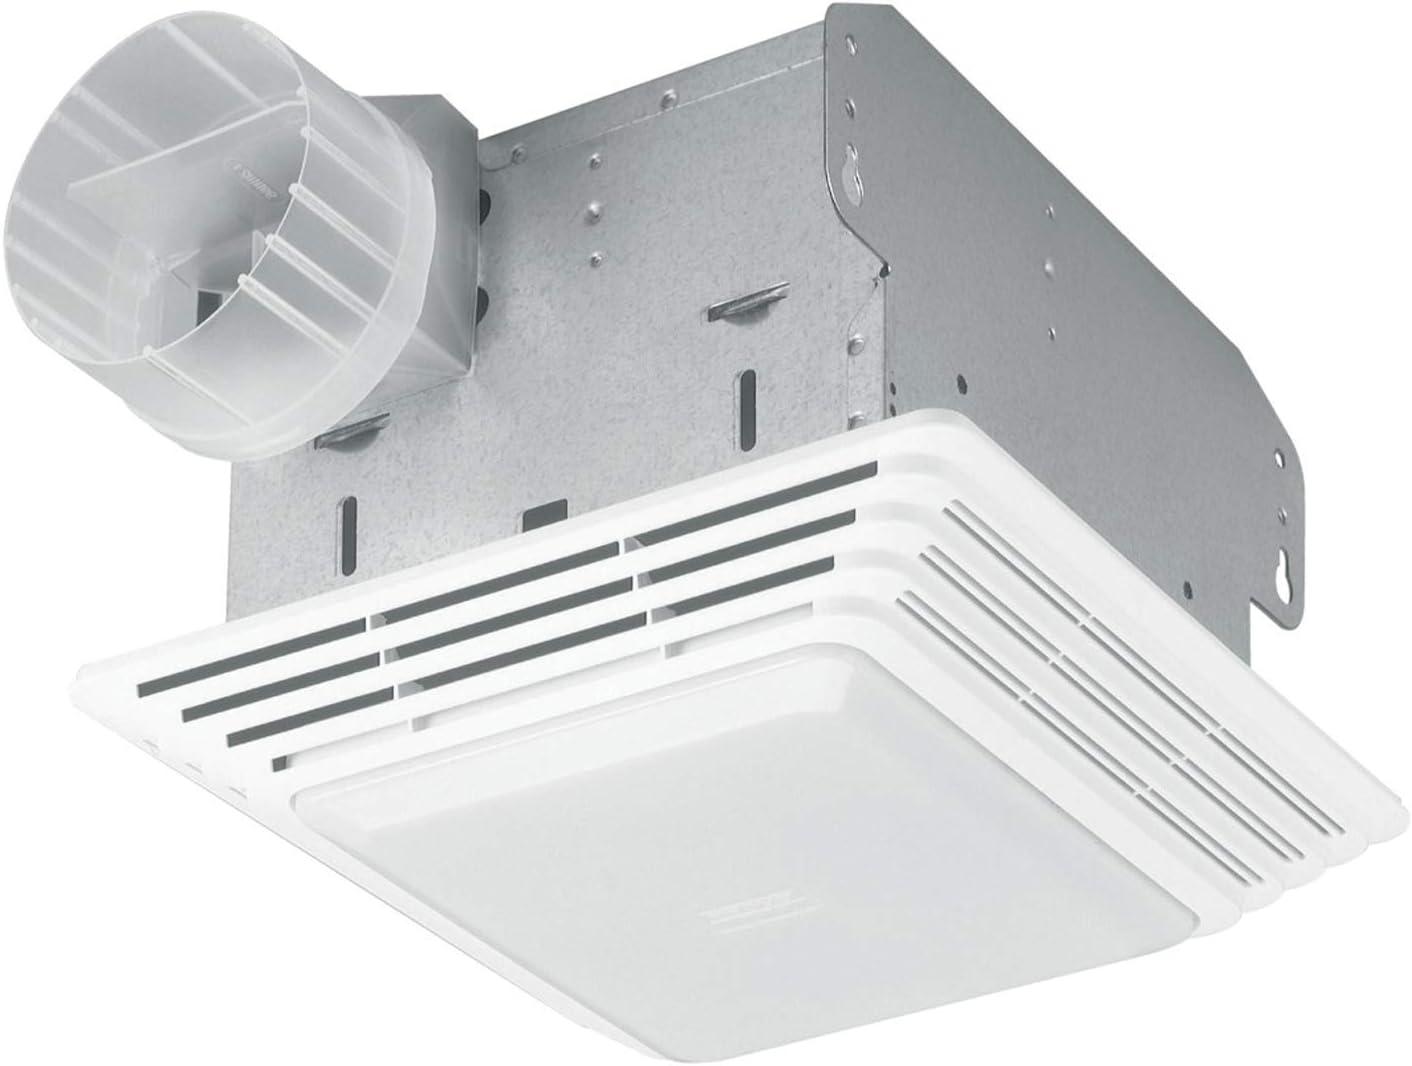 Amazon Com Broan Nutone Hd80l Heavy Duty Ventilation Fan Combo For Bathroom And Home 100 Watt Incandescent Light 80 Cfm Matte White Home Improvement